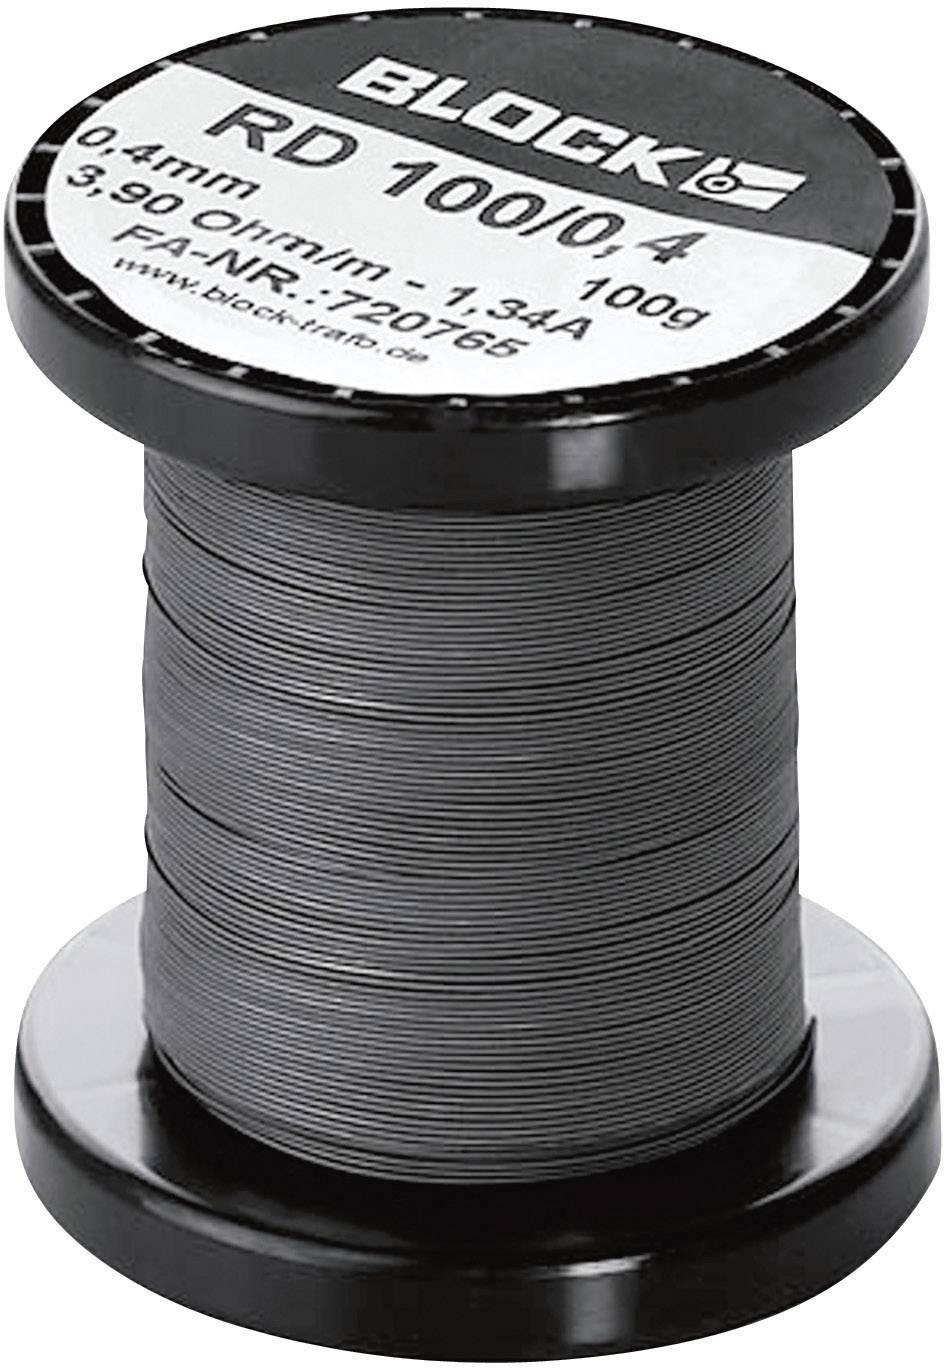 Odporový drát (konstantan) 0.975 Ω/m Block RD 100/0,8 22 m